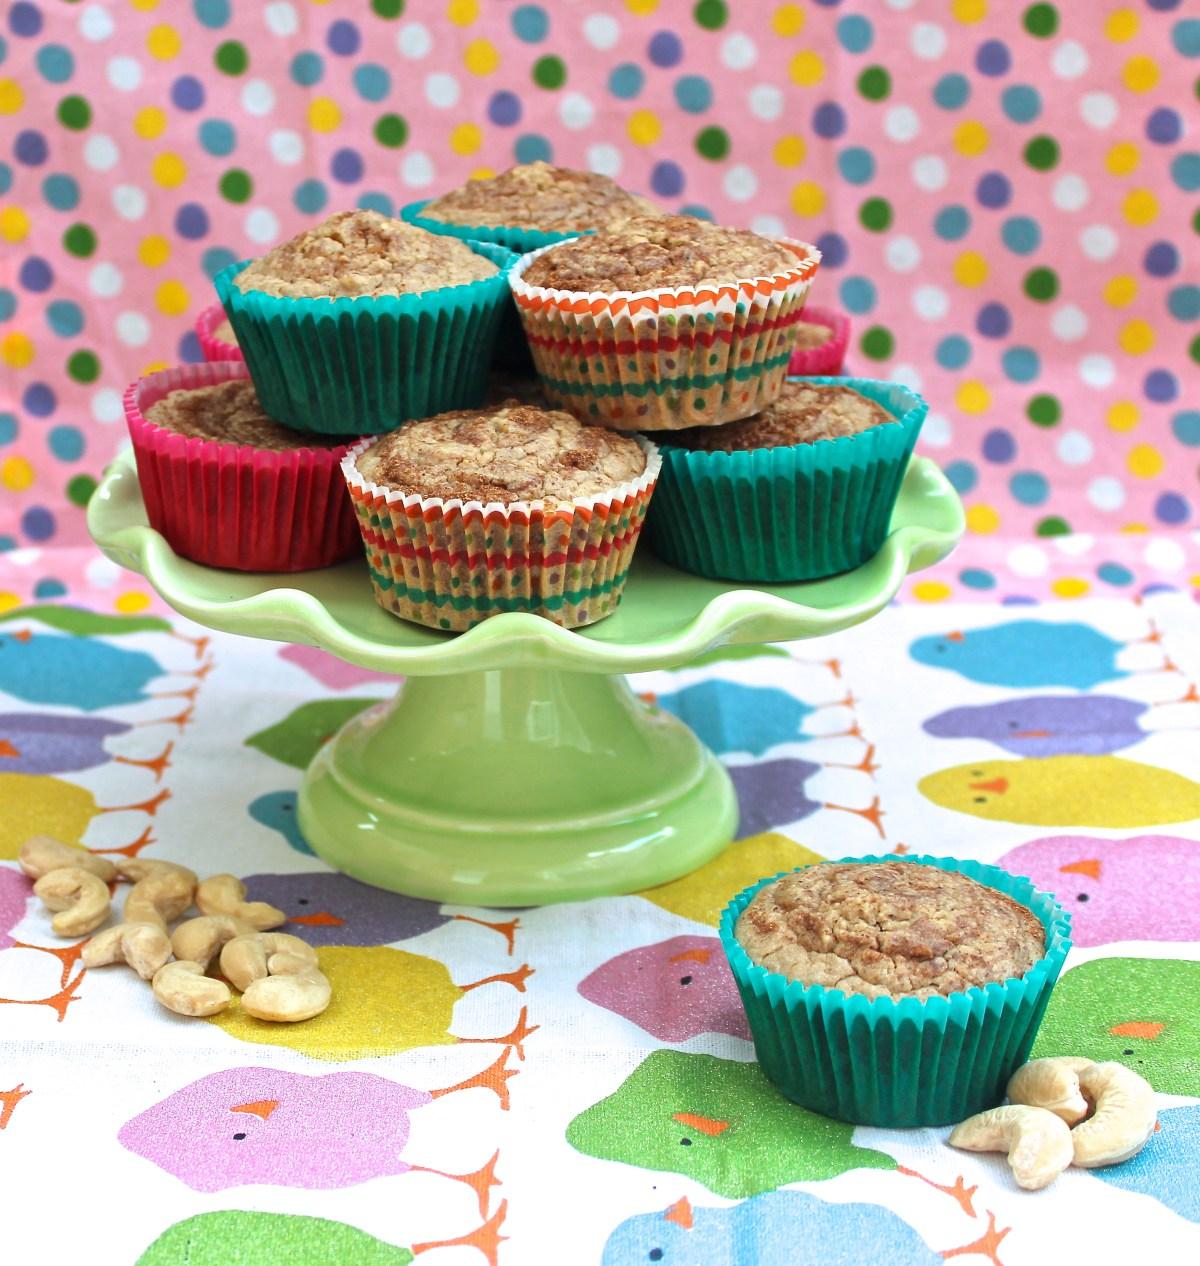 Cinnamon Cashew Blender Muffins (Low-GI)